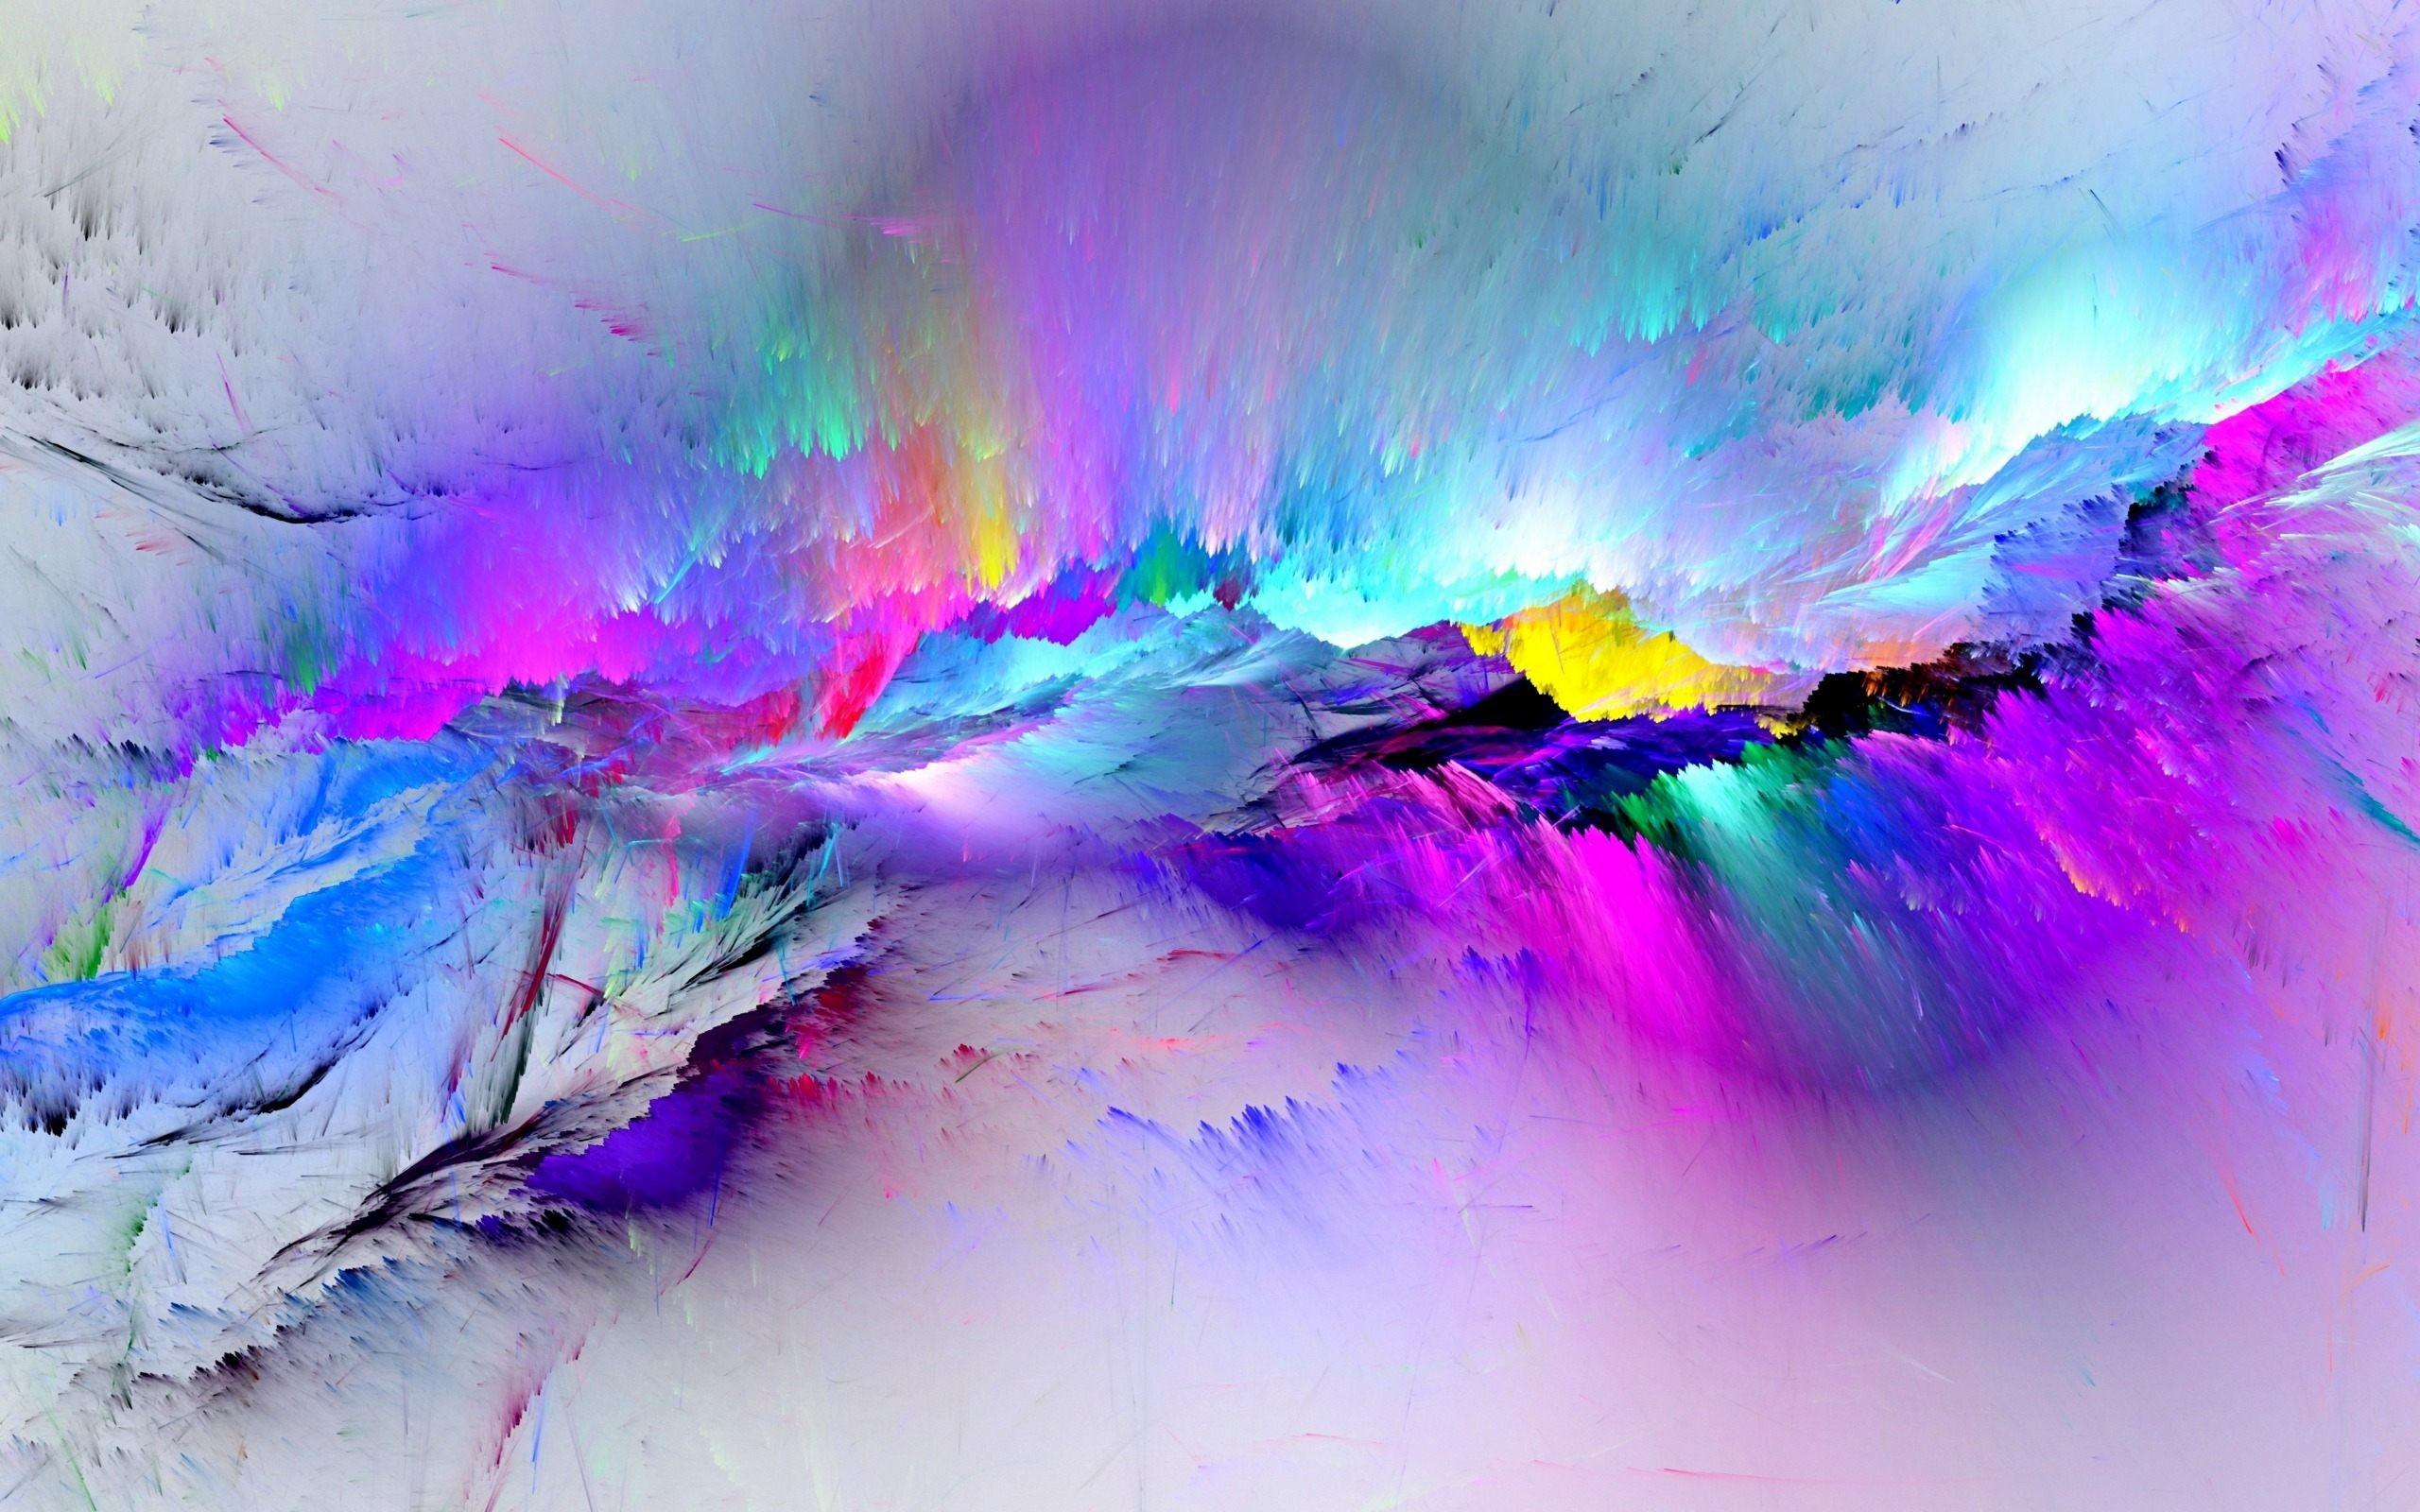 Paint Color Splash Background Wallpaper for desktop and mobile in high  resolution download. We have